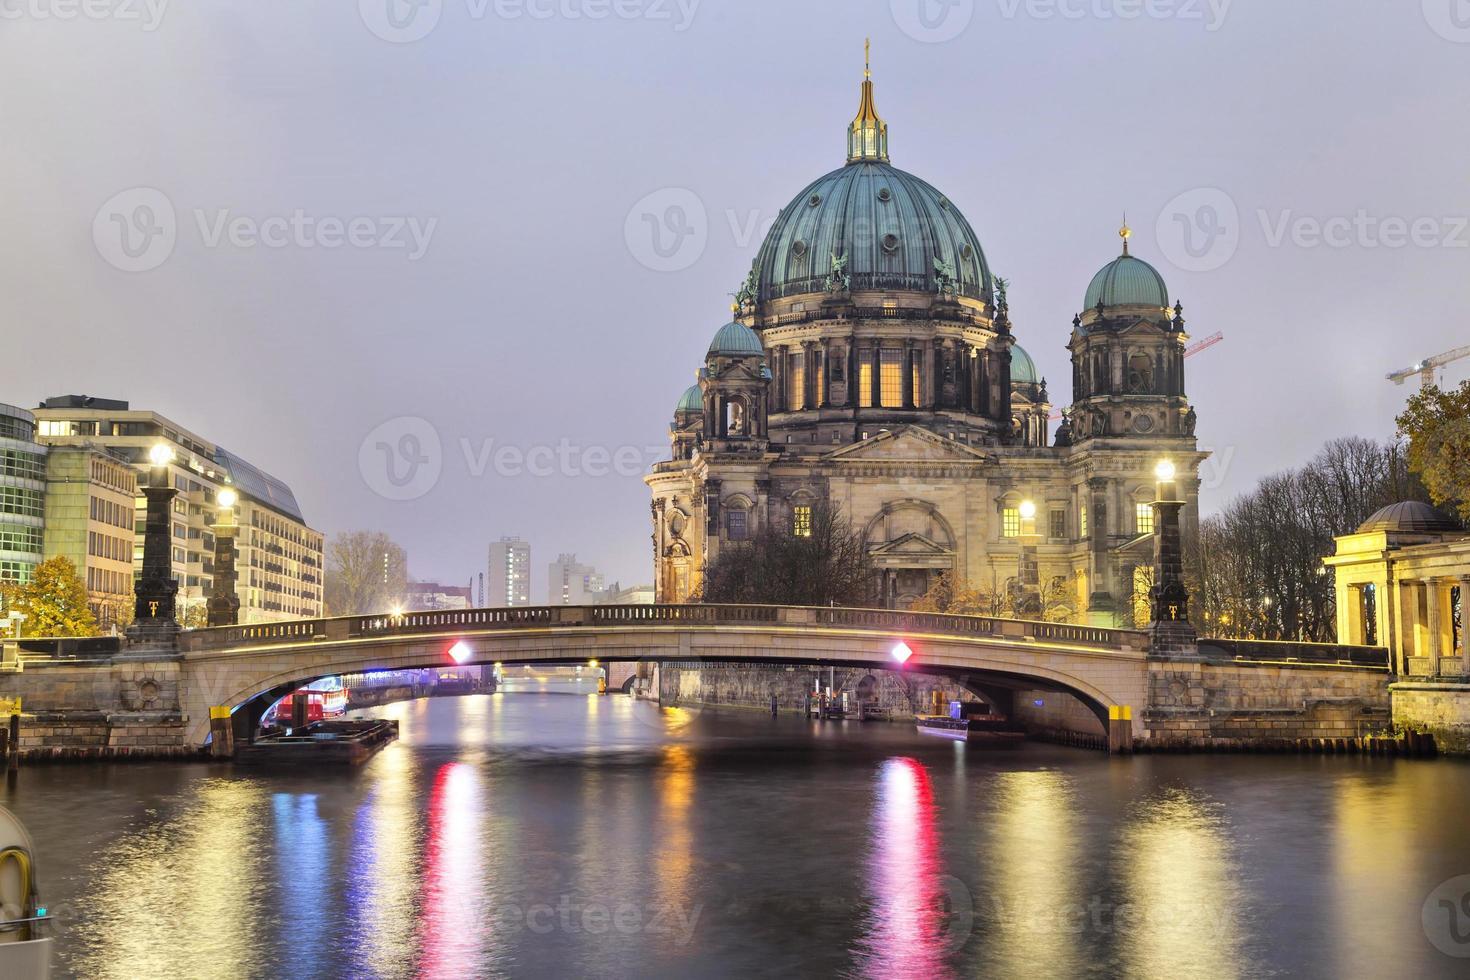 berliner kathedrale und die brücke über die spree foto